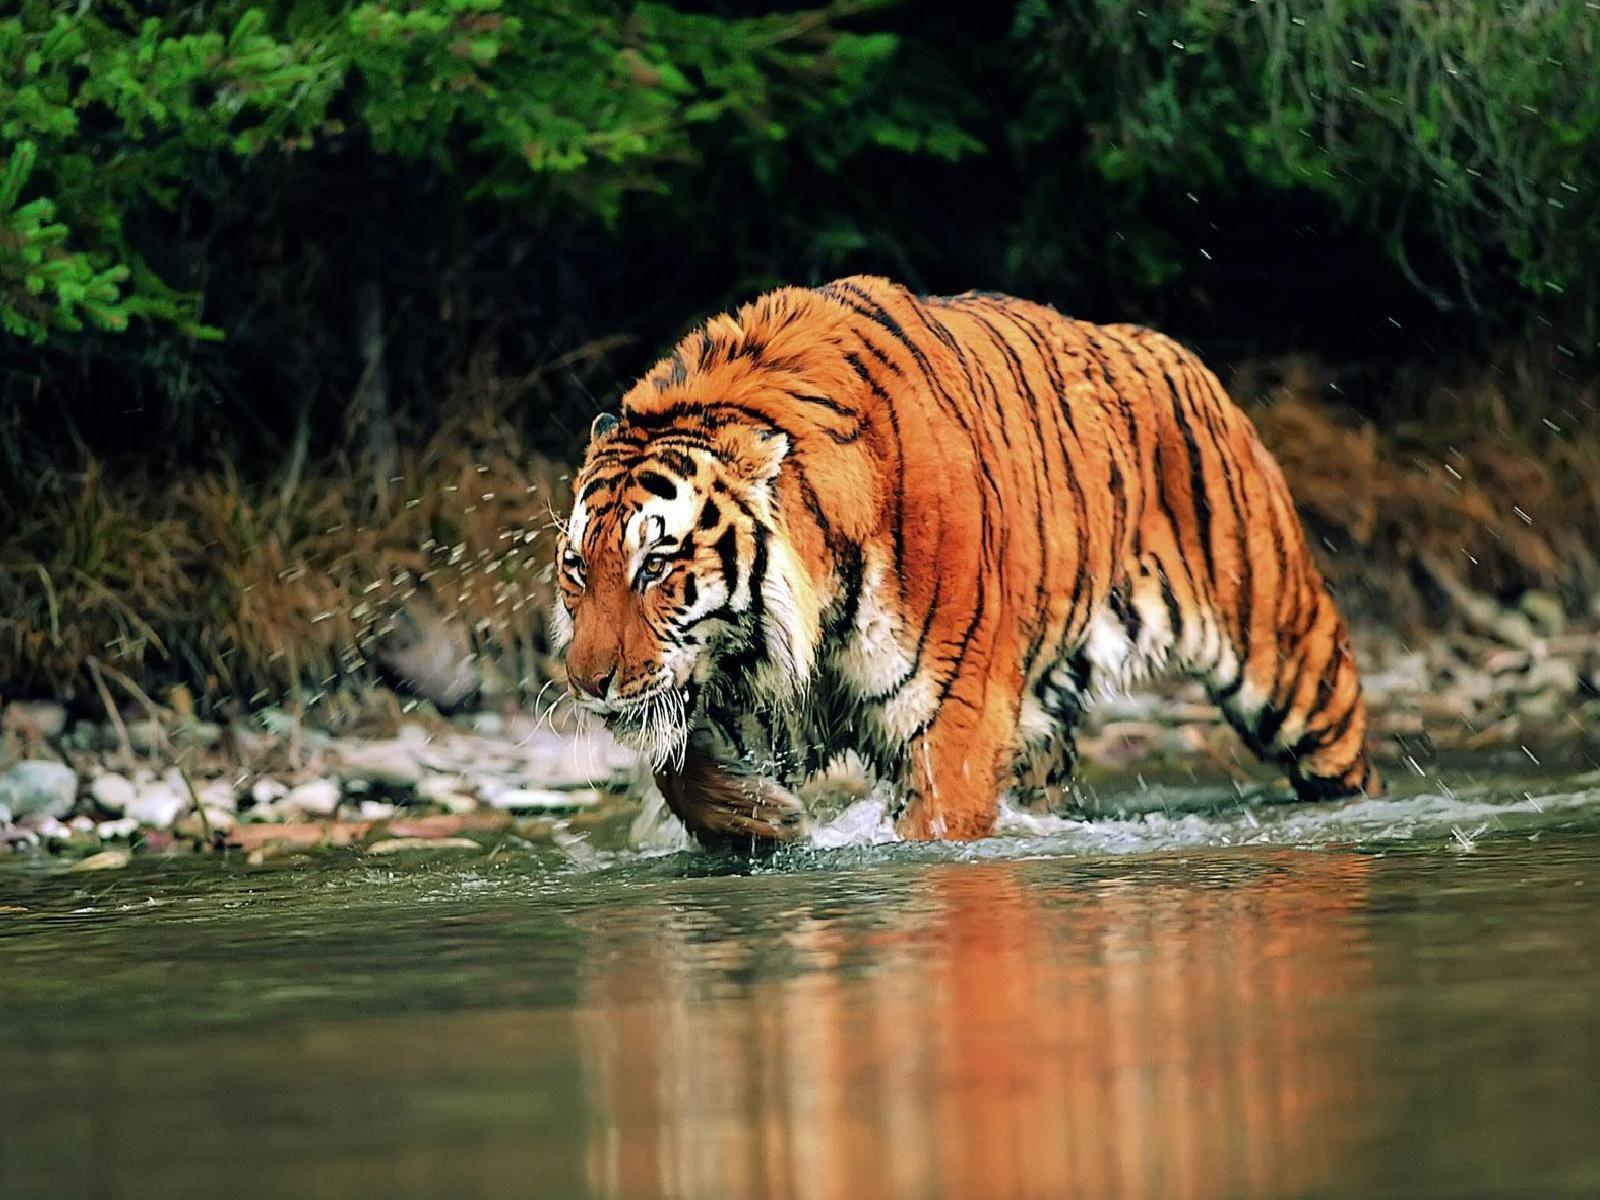 http://2.bp.blogspot.com/-uXGjNsSXTPA/TlcFvyVVF9I/AAAAAAAAAS8/2qkHLvlYDl4/s1600/Siberian_Tiger_3.jpg